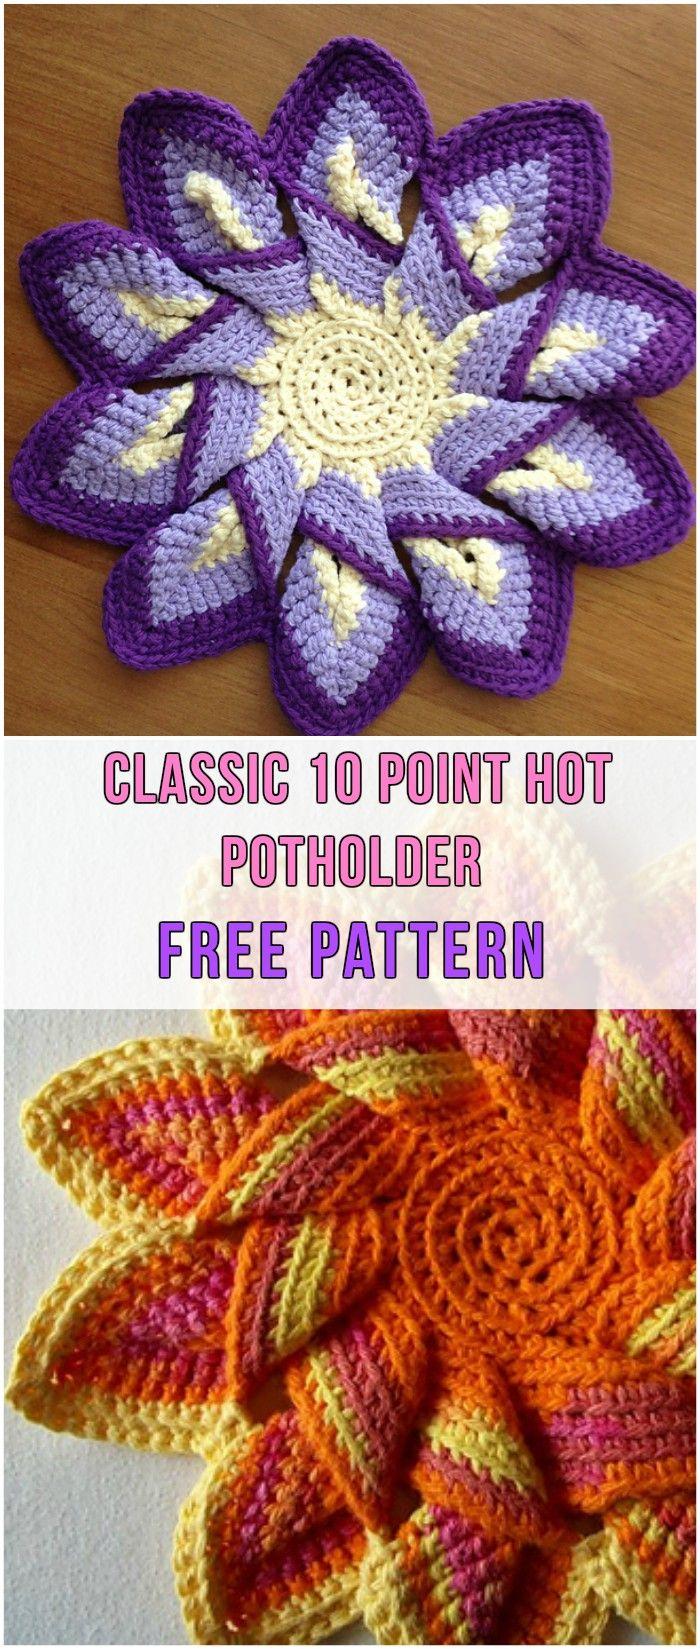 Classic 10 Point Hot Potholder Free Pattern #crochet #potholder #yarn #hook #freepattern #colorful